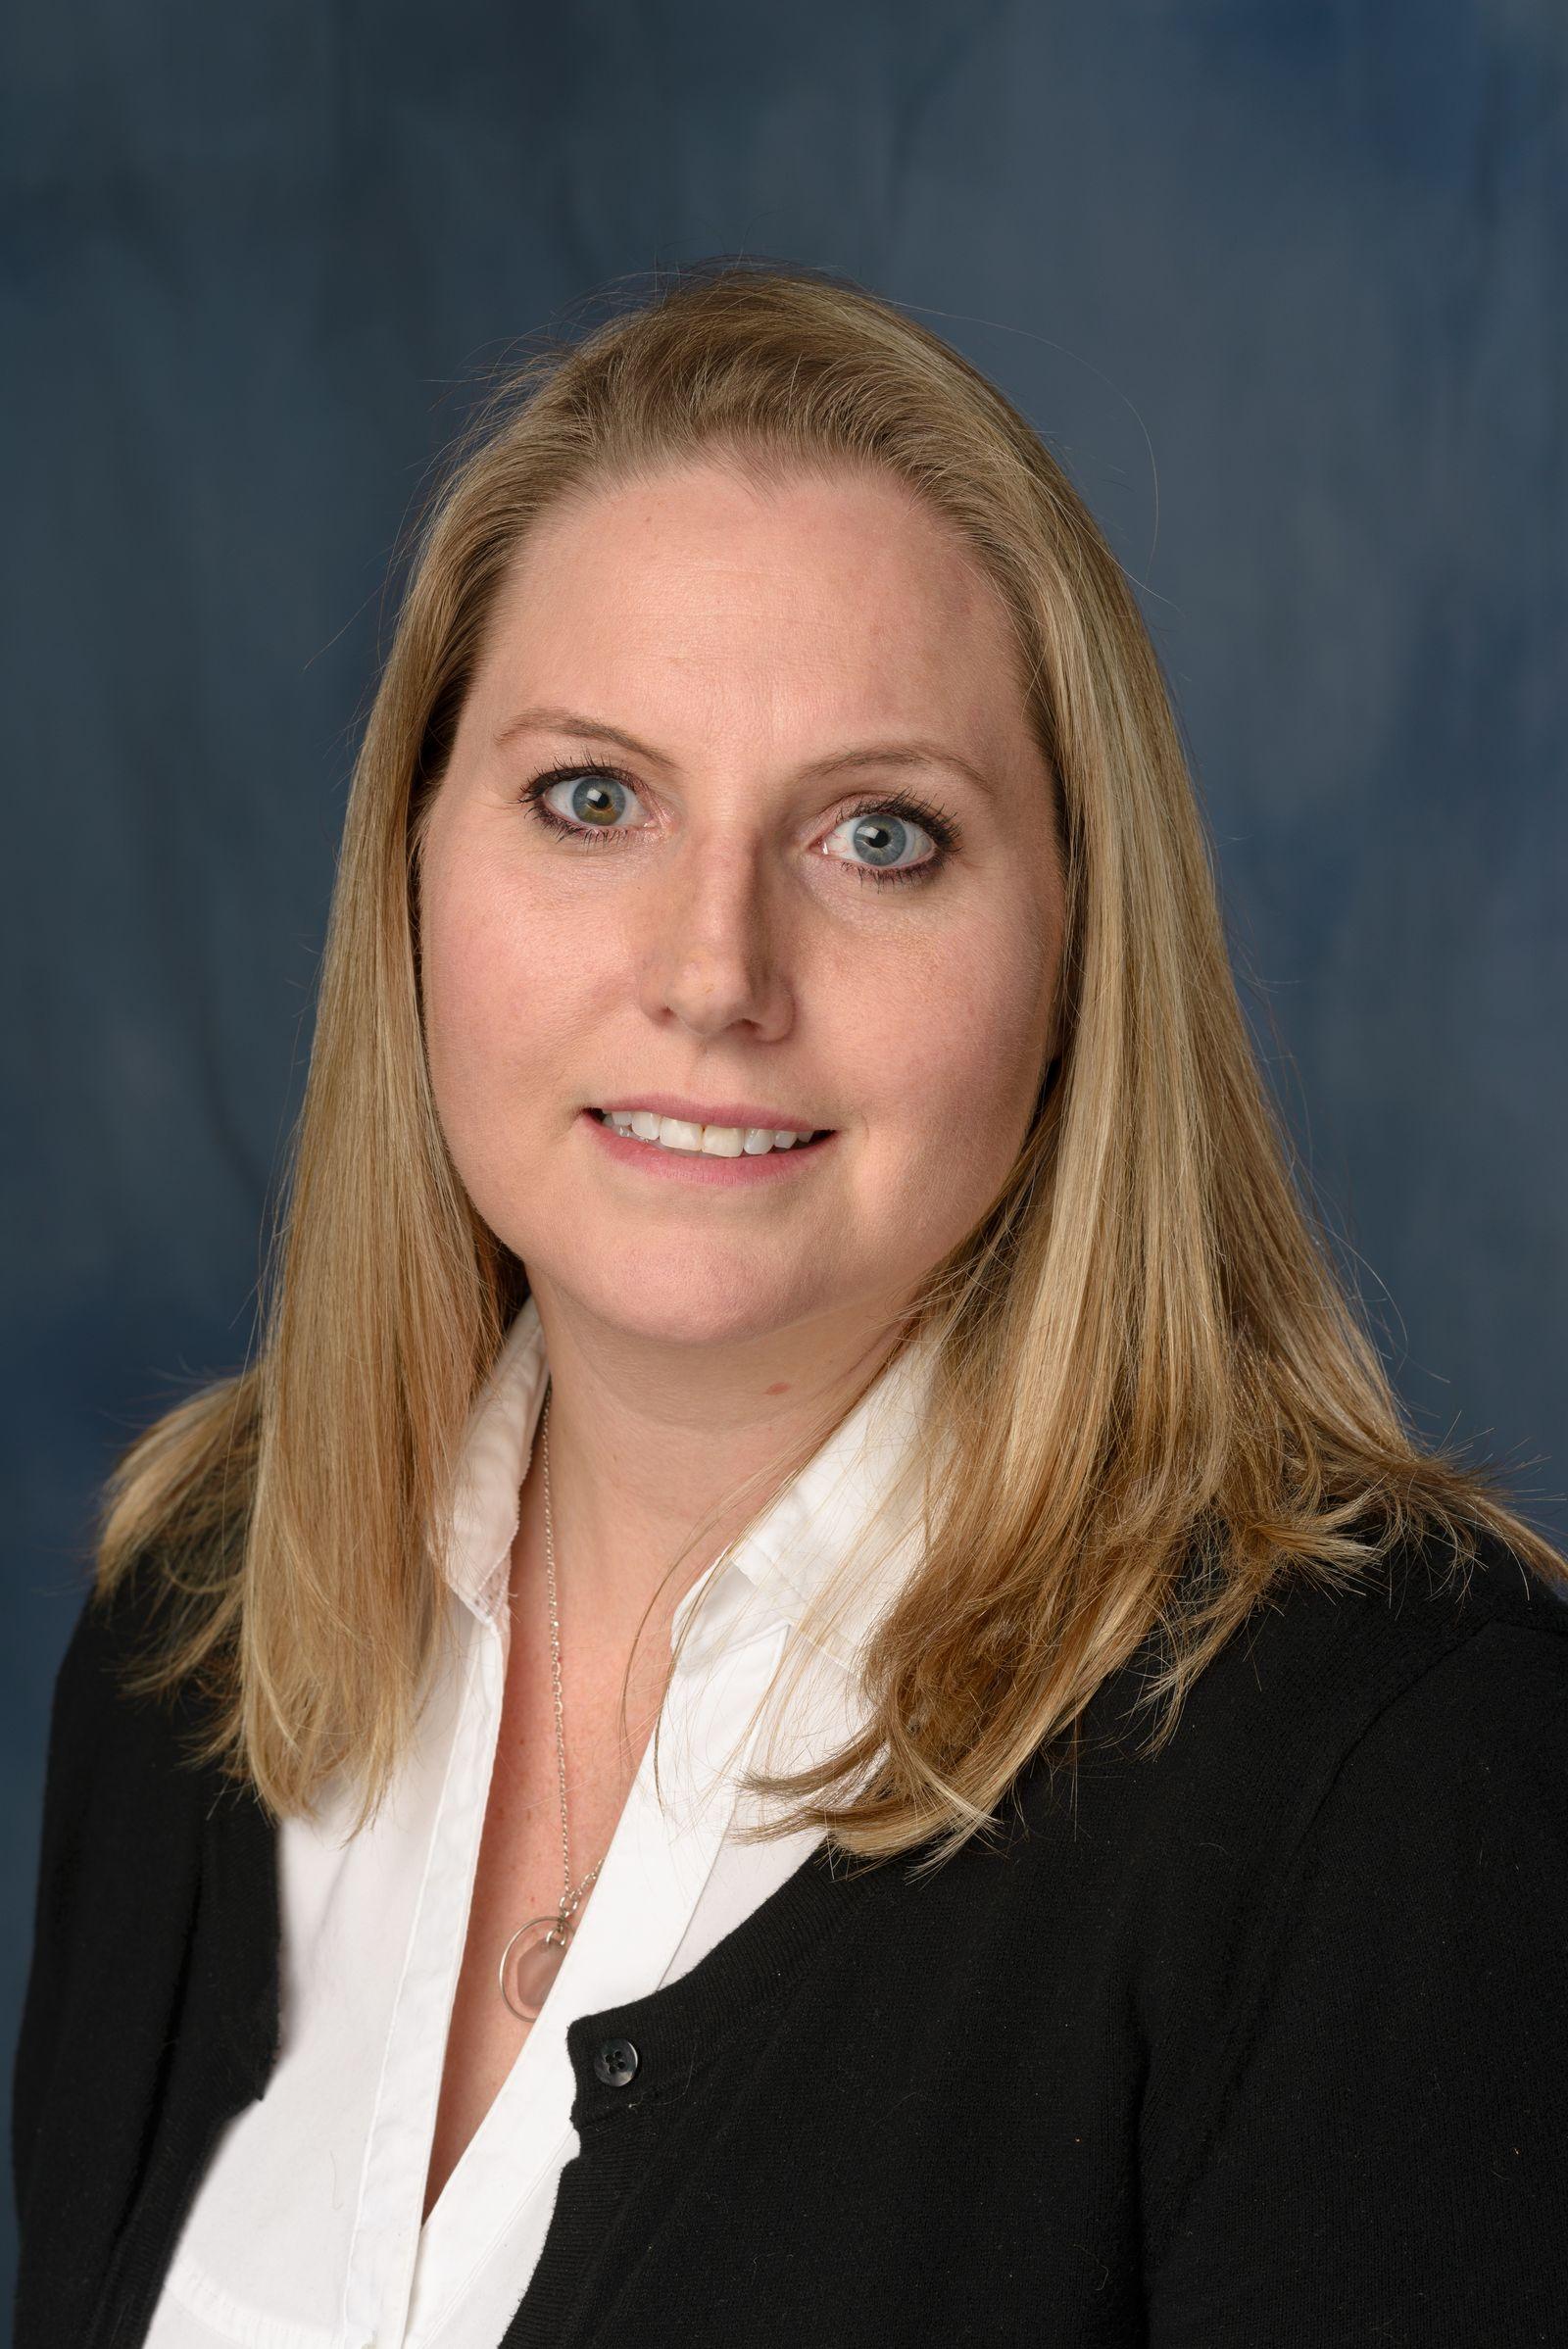 Nicole Bristow